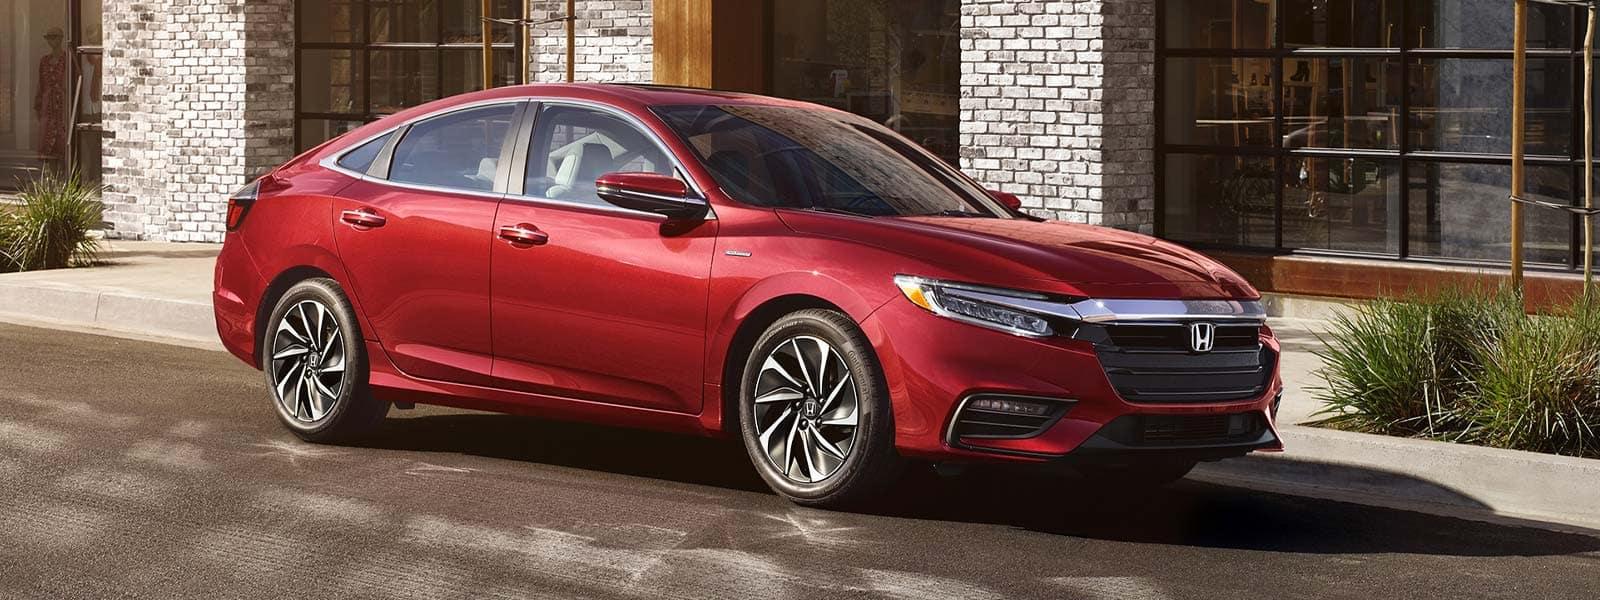 Lease or finance 2022 Honda Insight in Martinsville Virginia